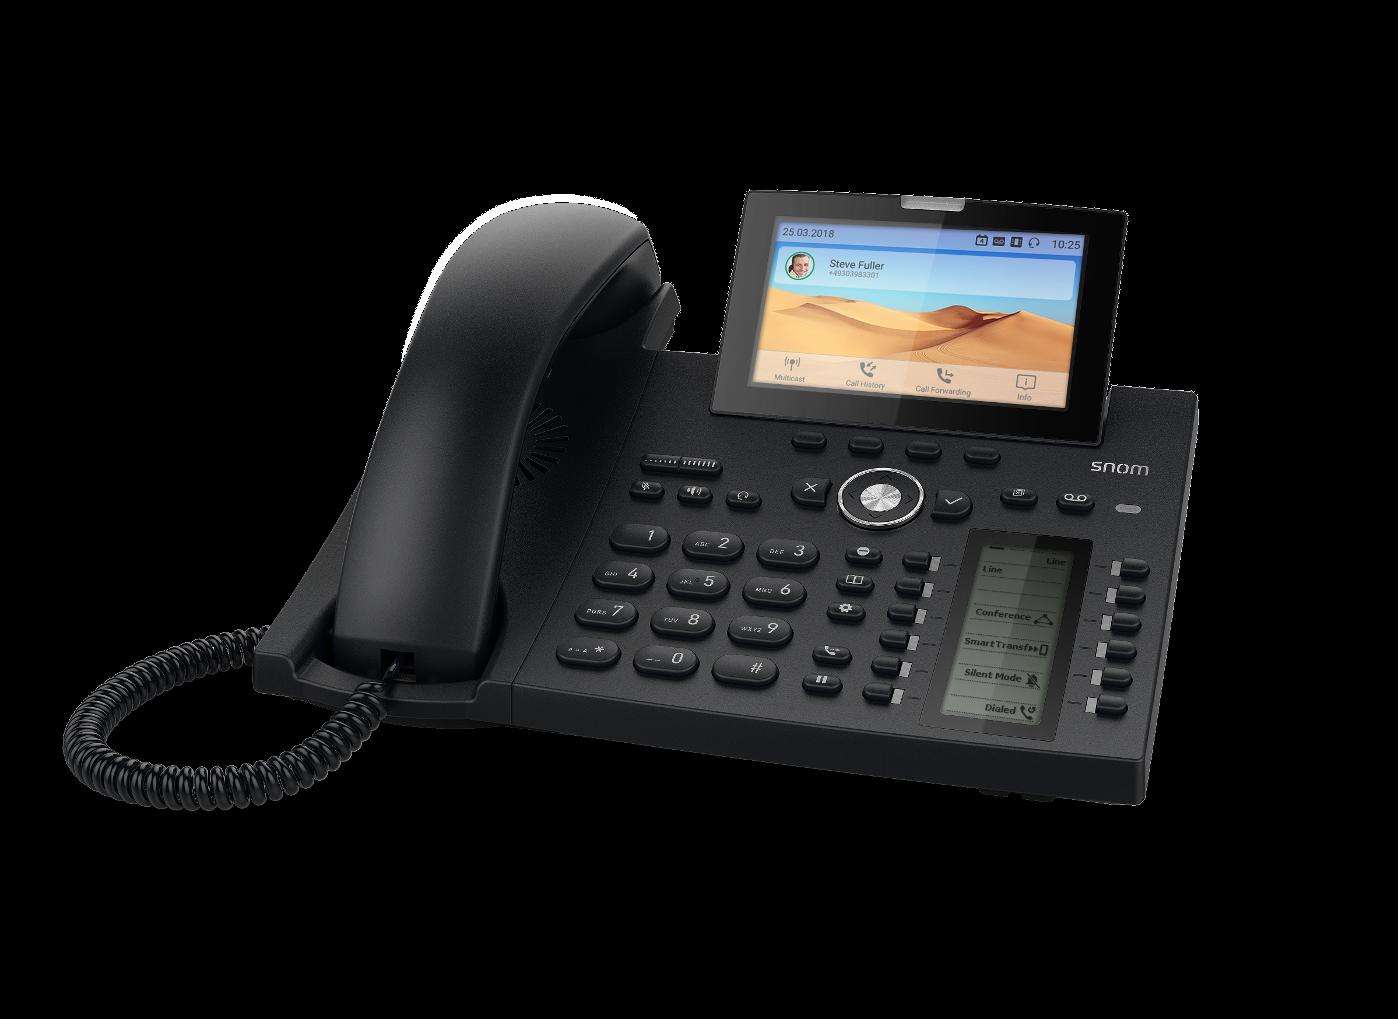 Snom präsentiert Flaggschiff  D385 SIP Telefon für gehobene Ansprüche!